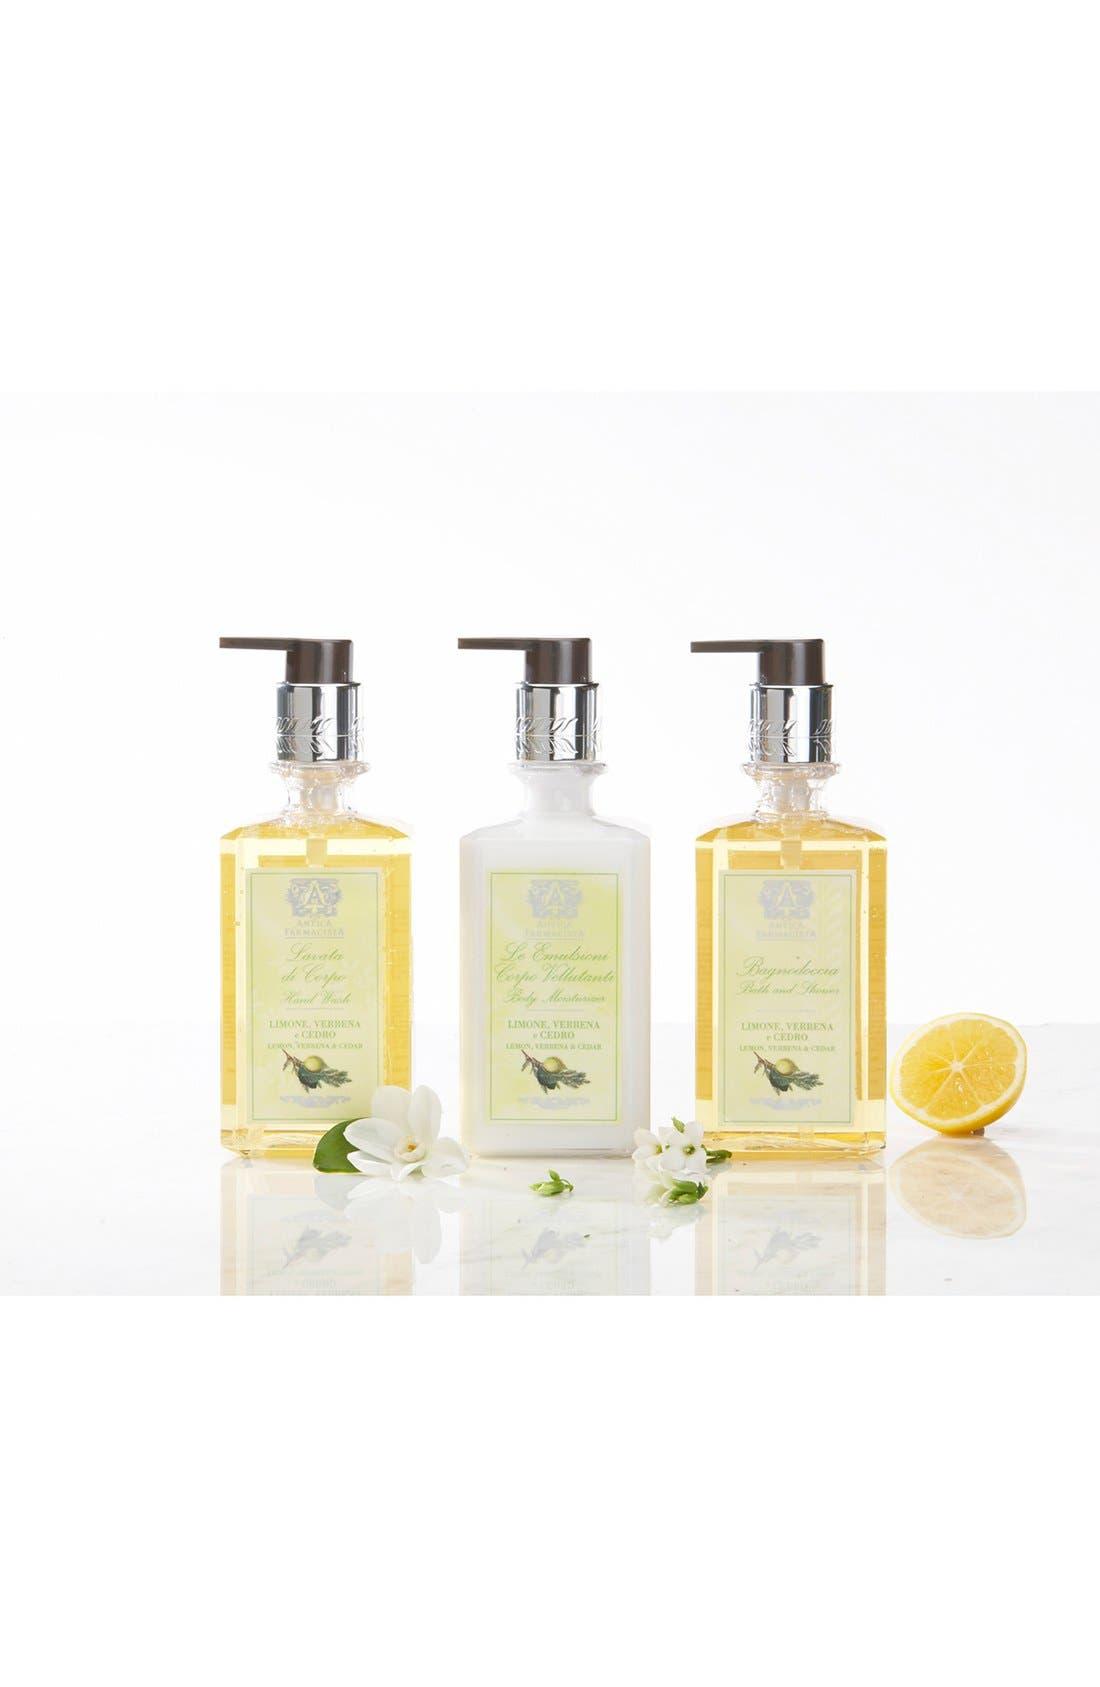 'Lemon, Verbena & Cedar' Body Moisturizer,                             Alternate thumbnail 2, color,                             NO COLOR